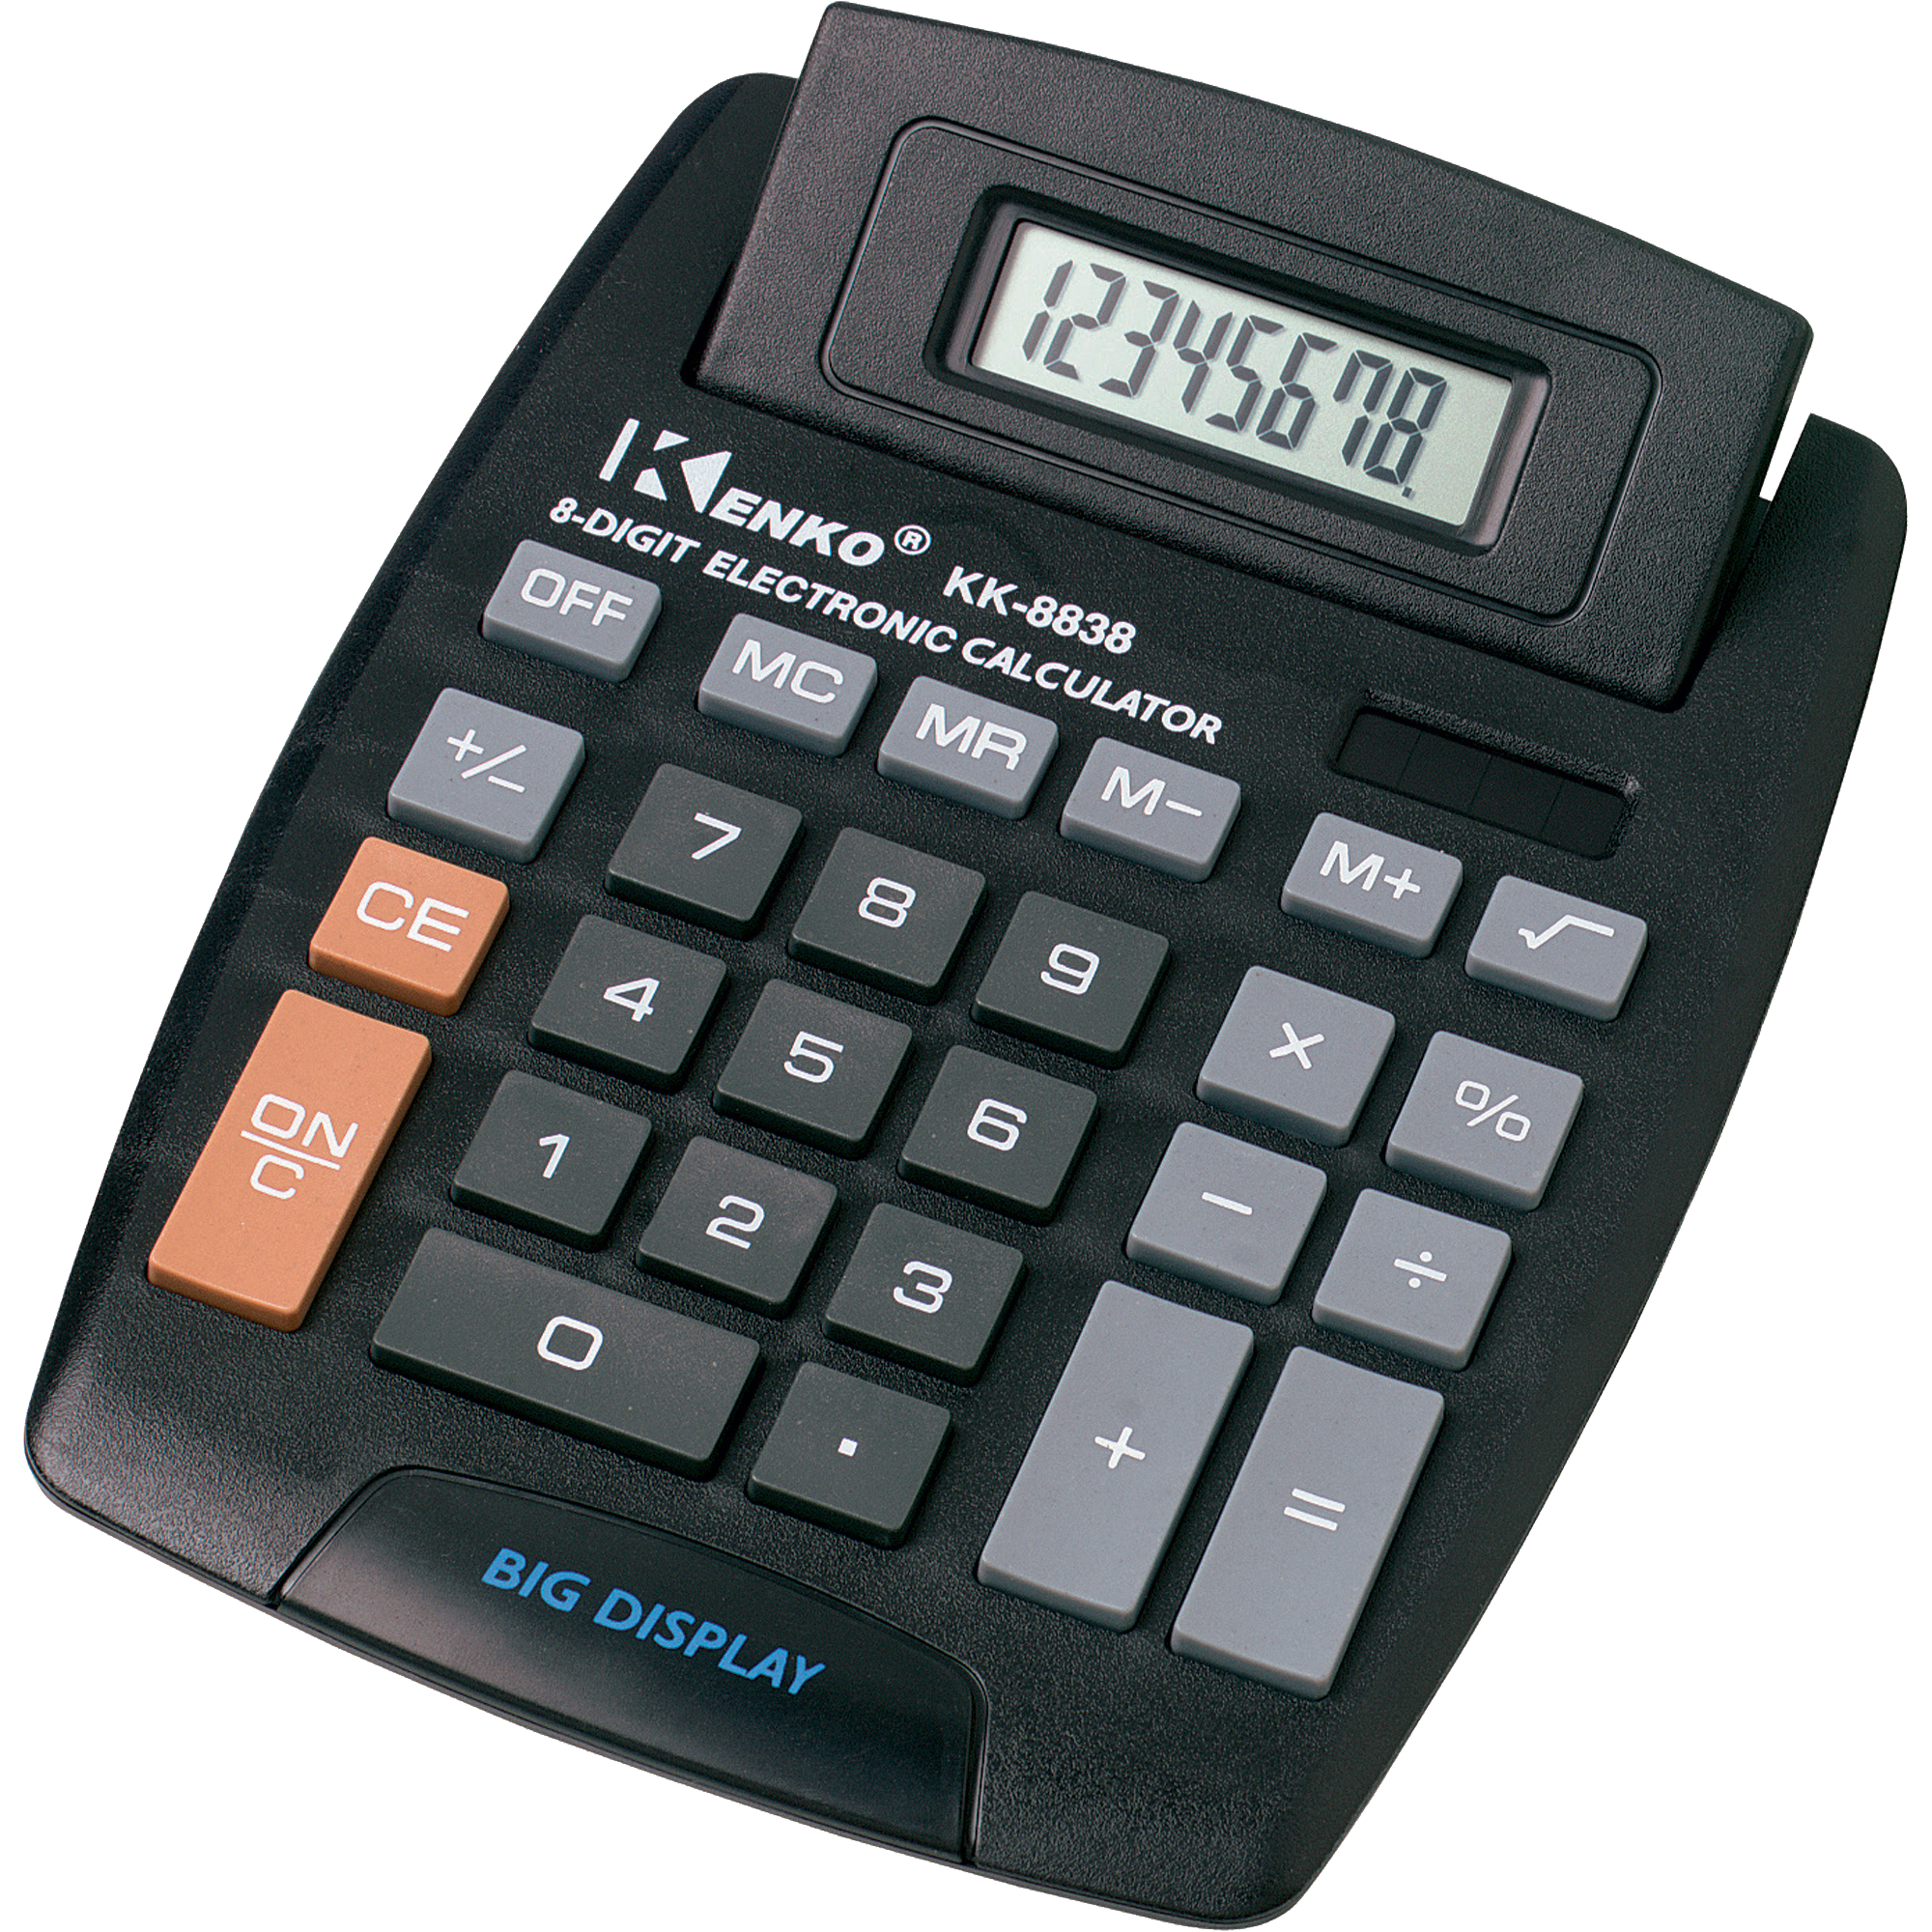 Calculator clipart calcu. Png image free download